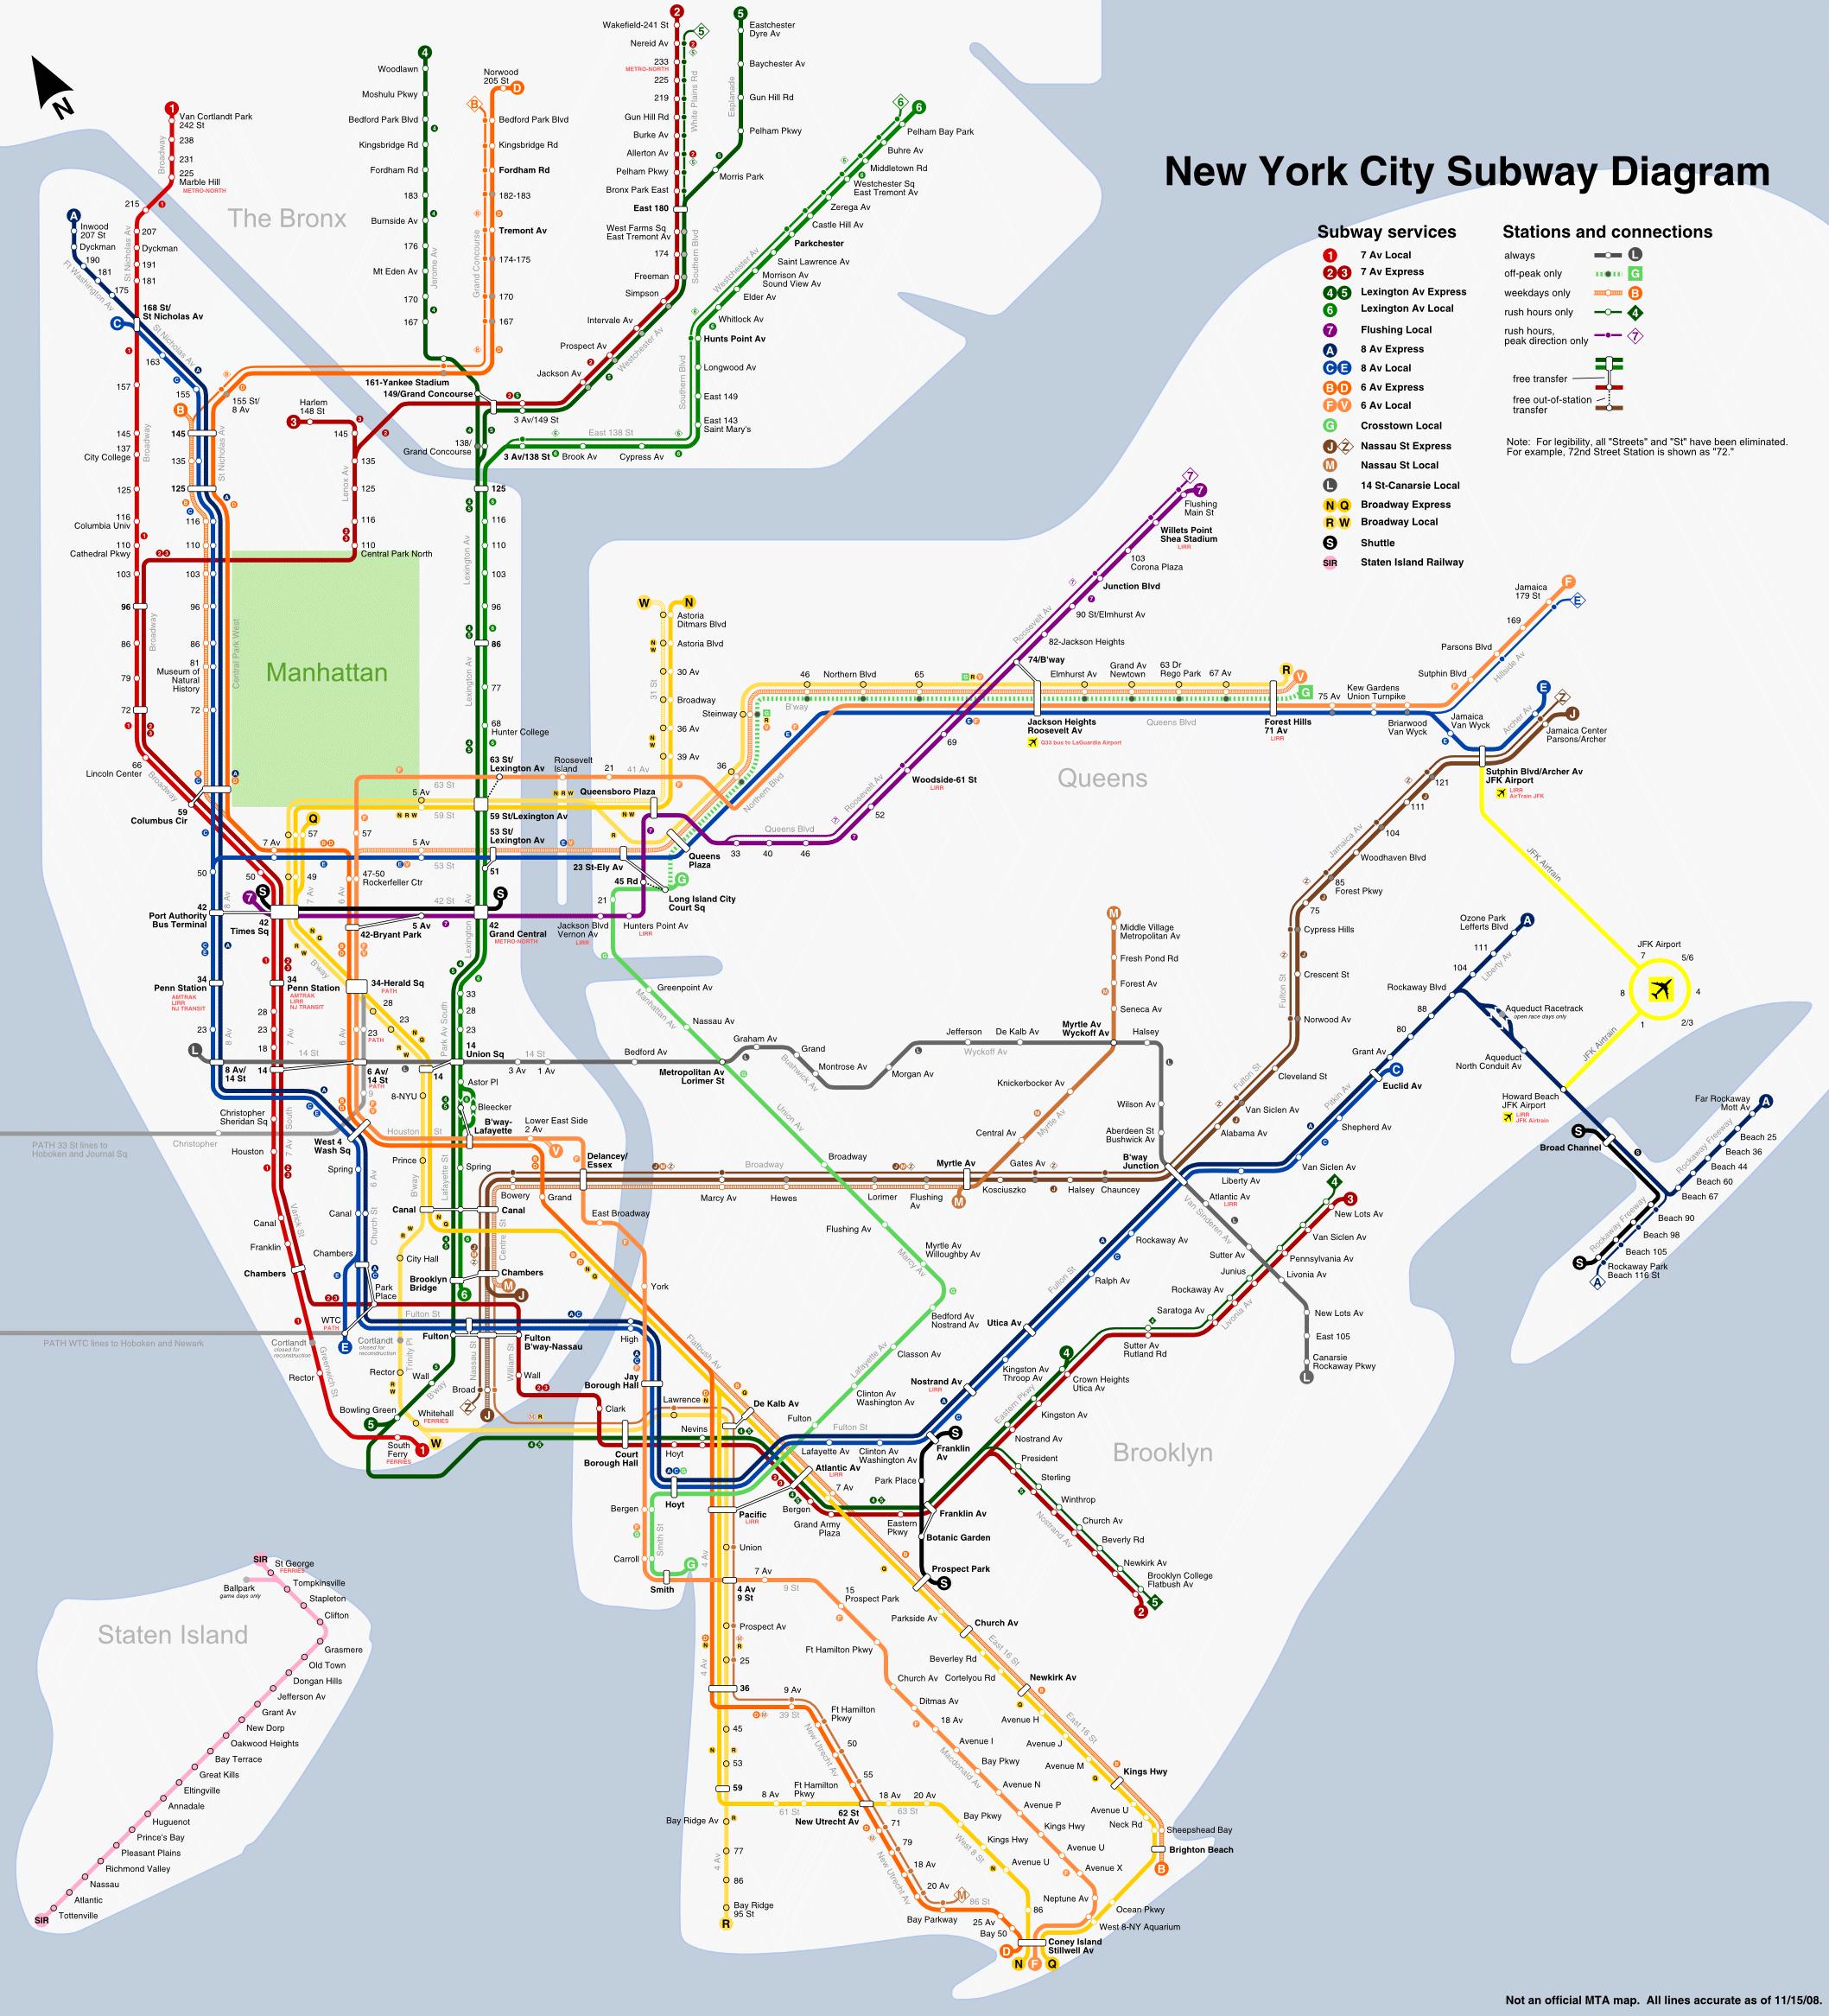 Fantasy New York Subway Map.New York Subway Png Transparent New York Subway Png Images Pluspng